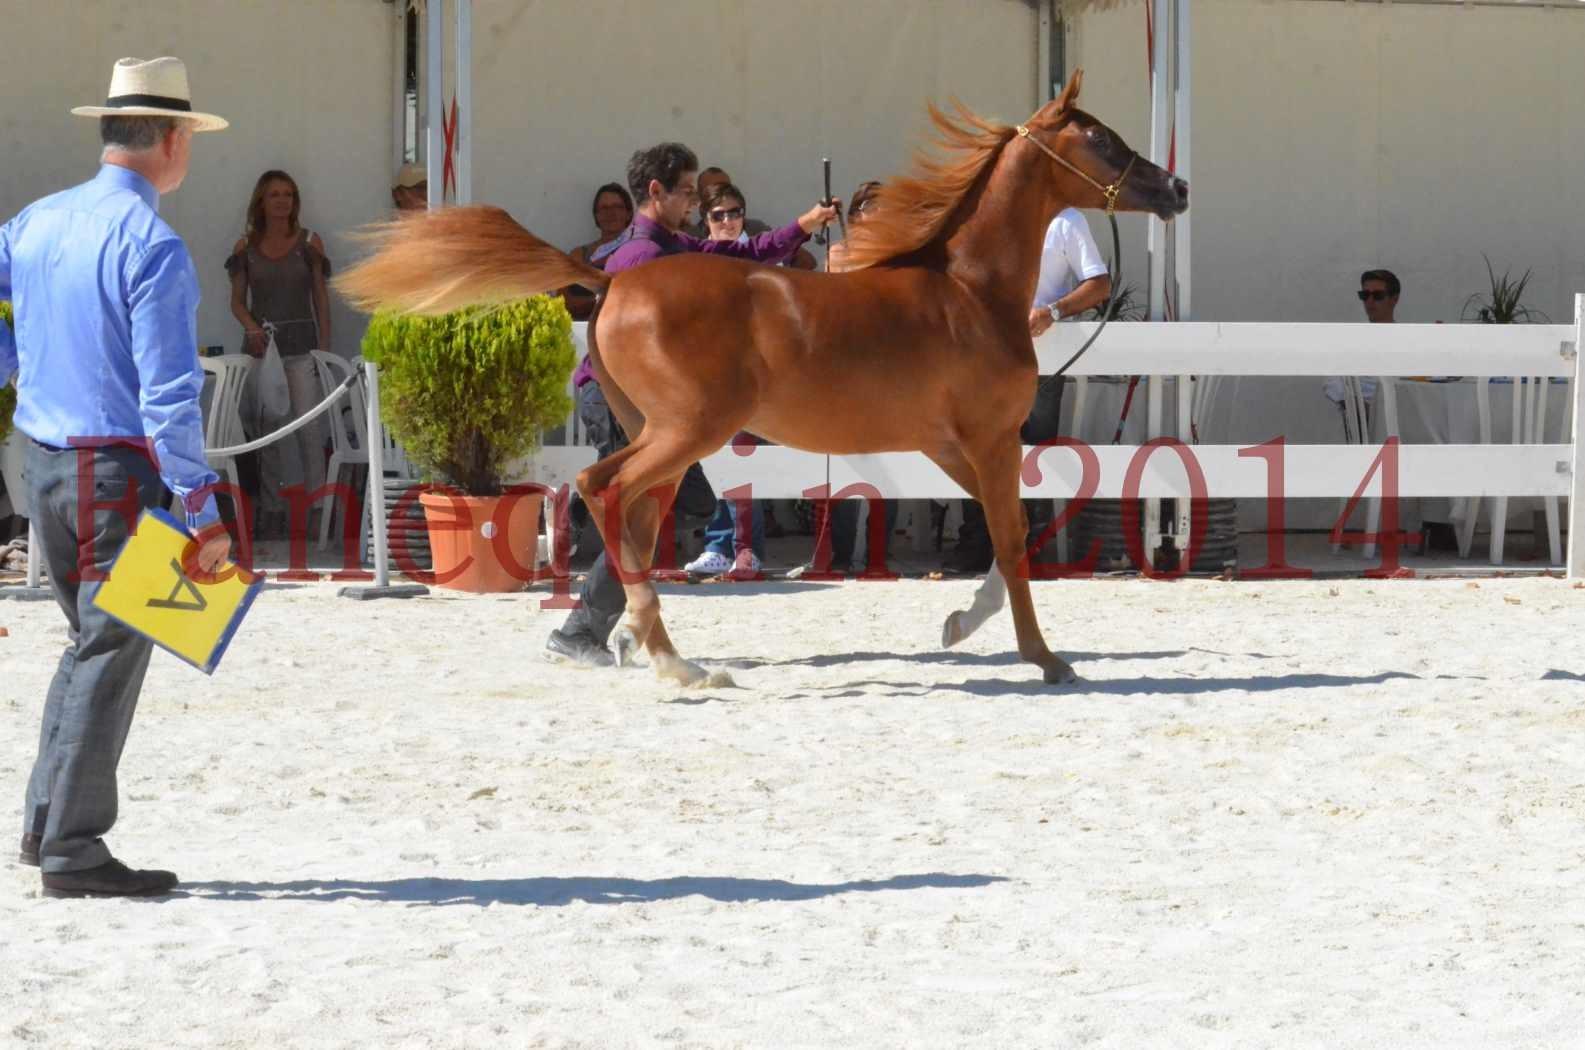 Concours National de Nîmes de chevaux ARABES 2014 - TSAR NERIO - 17